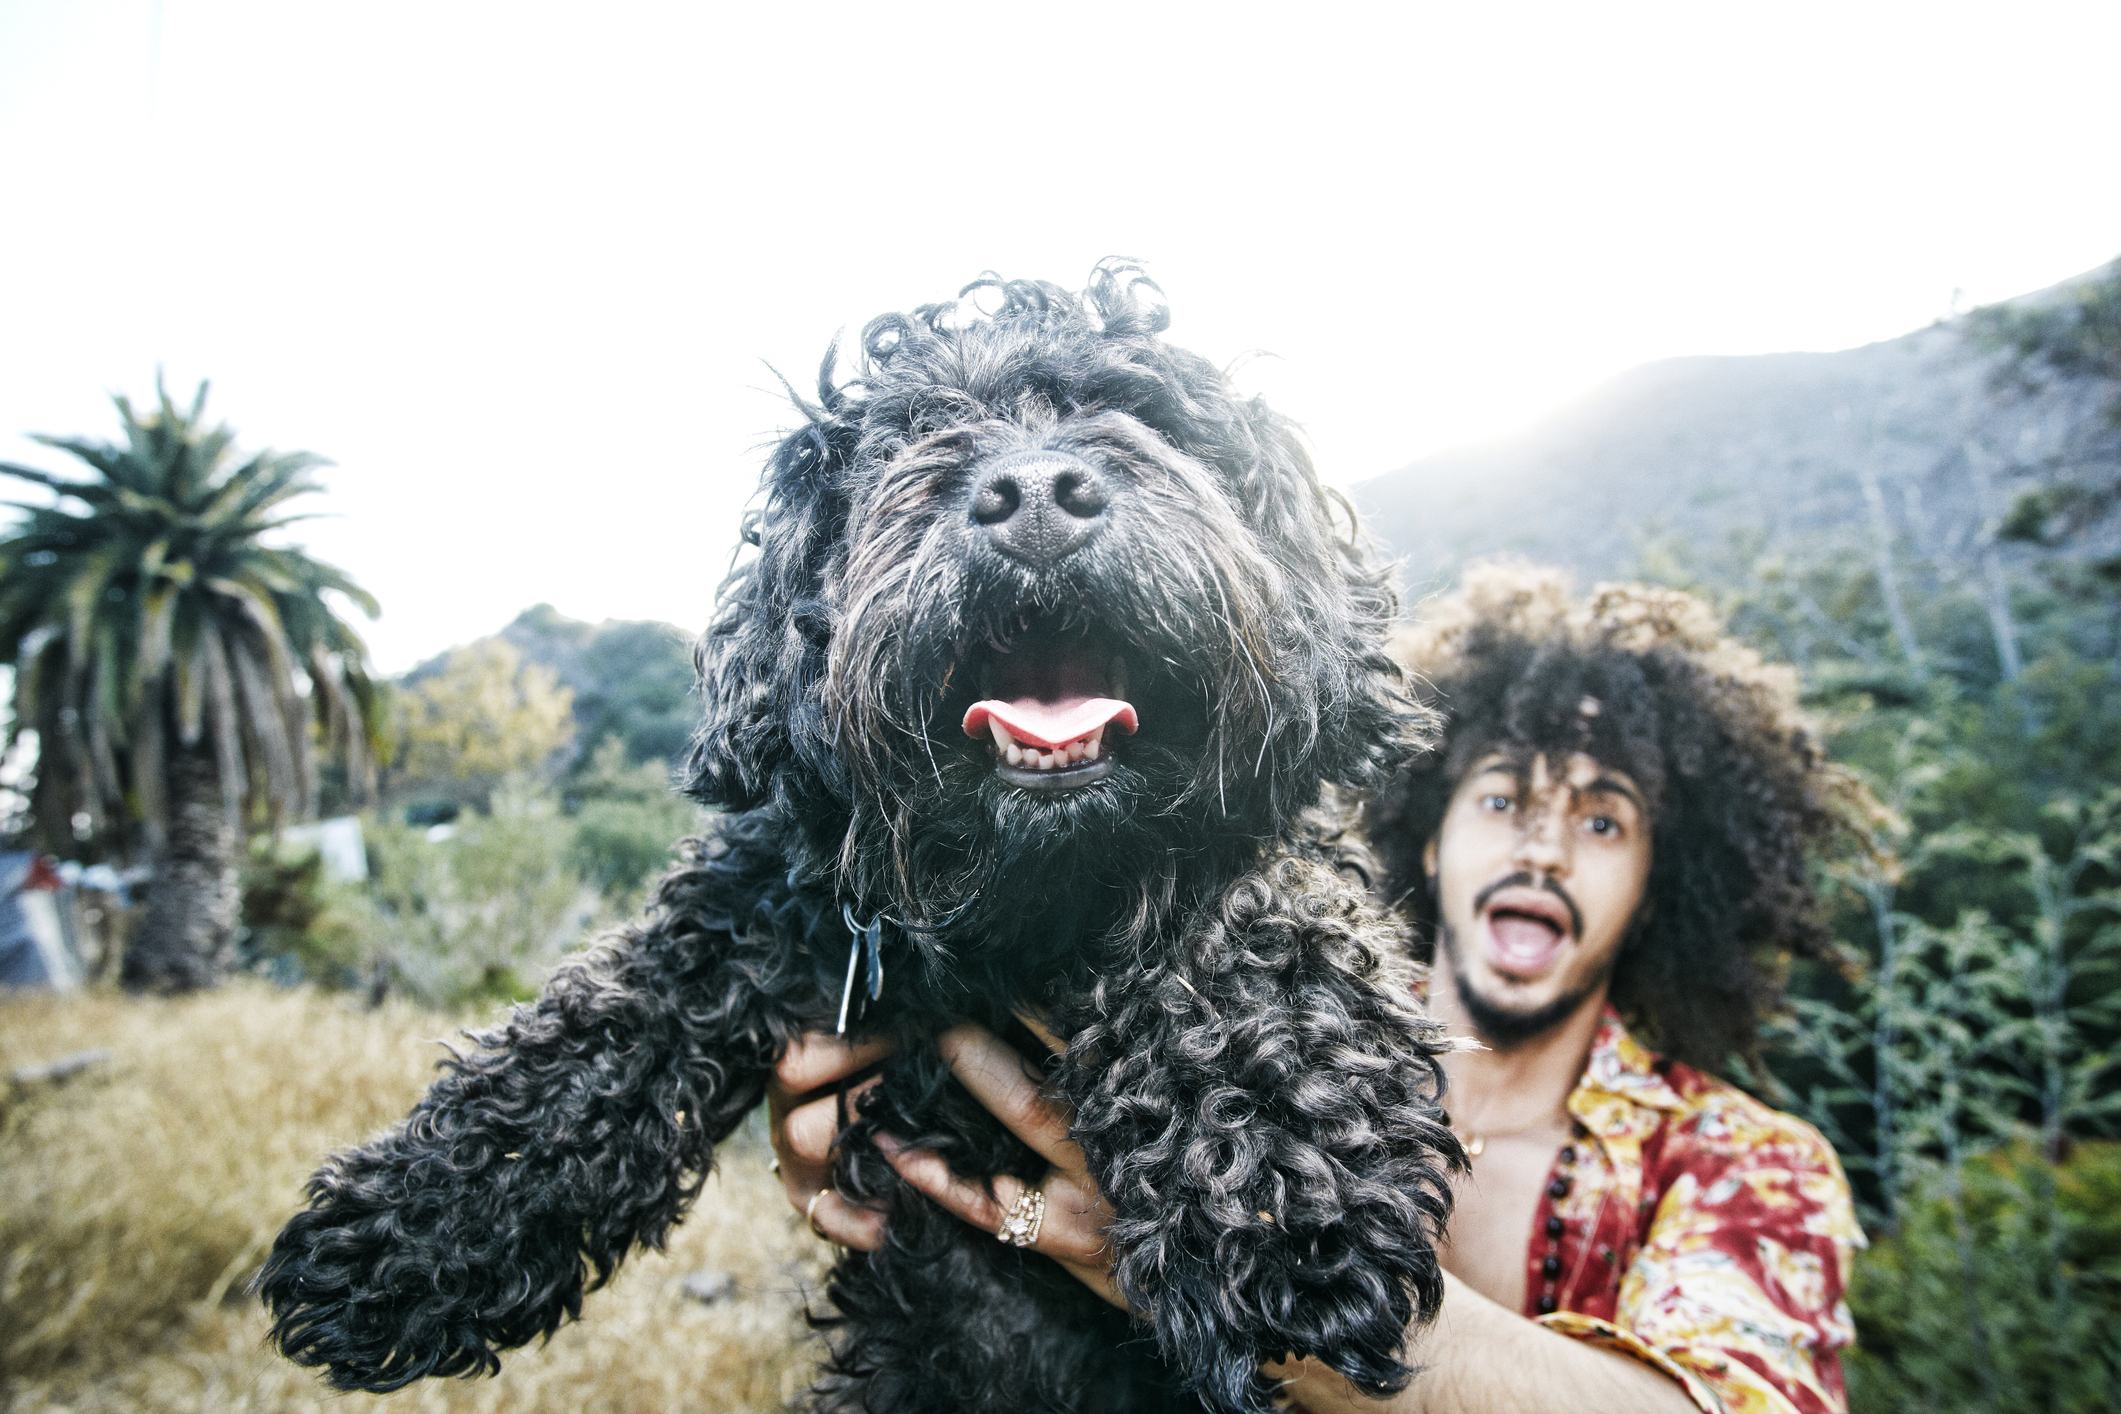 Mixed Race man holding shaggy dog